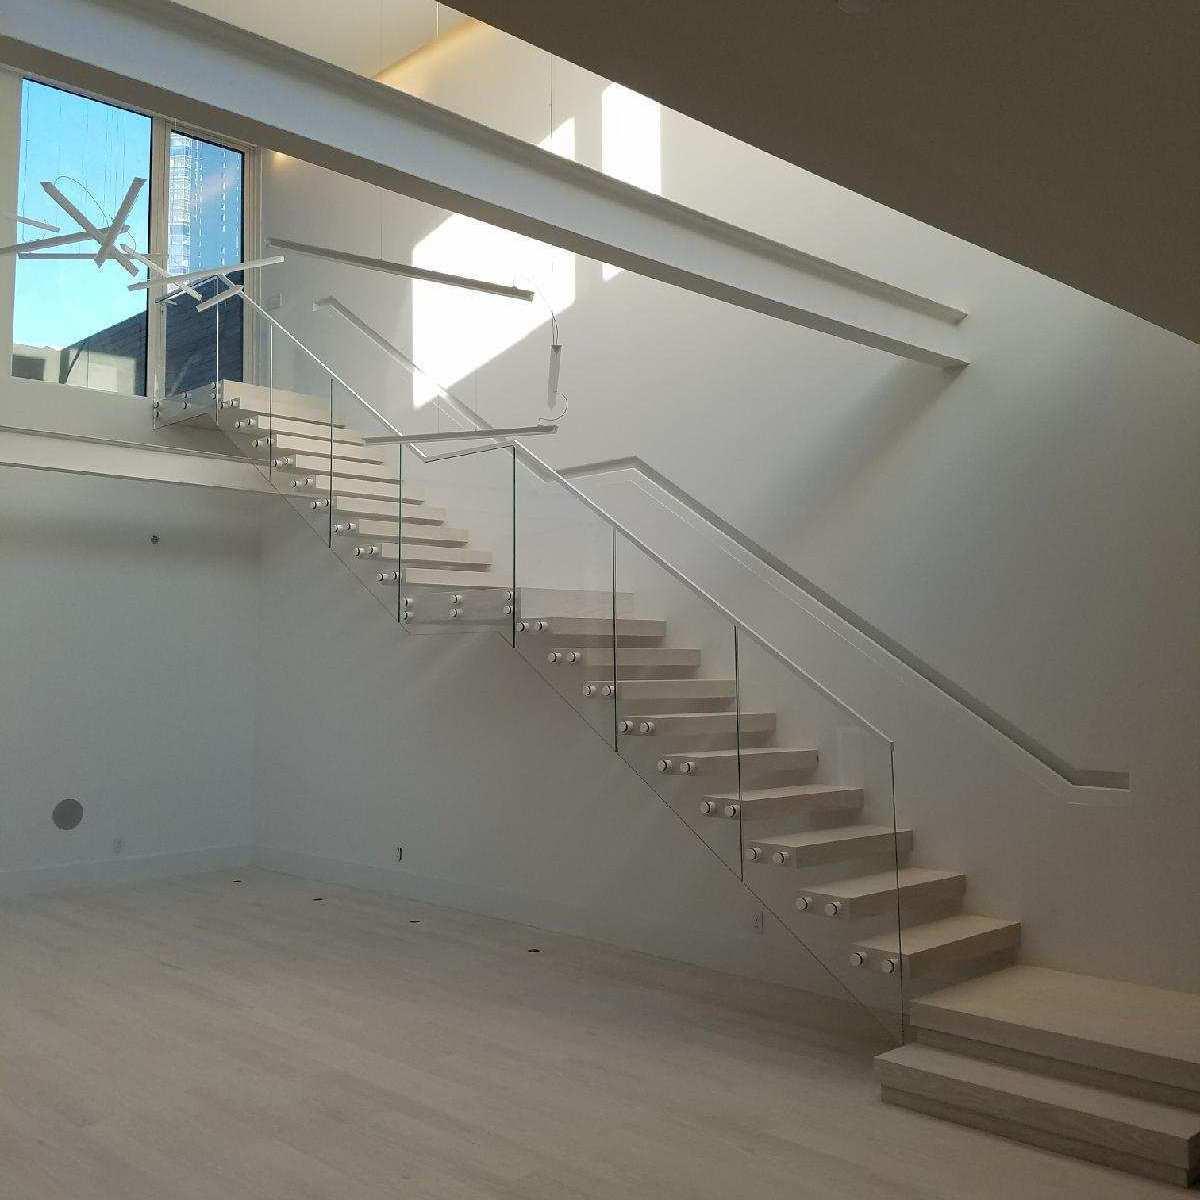 interiror stair rail square.jpeg